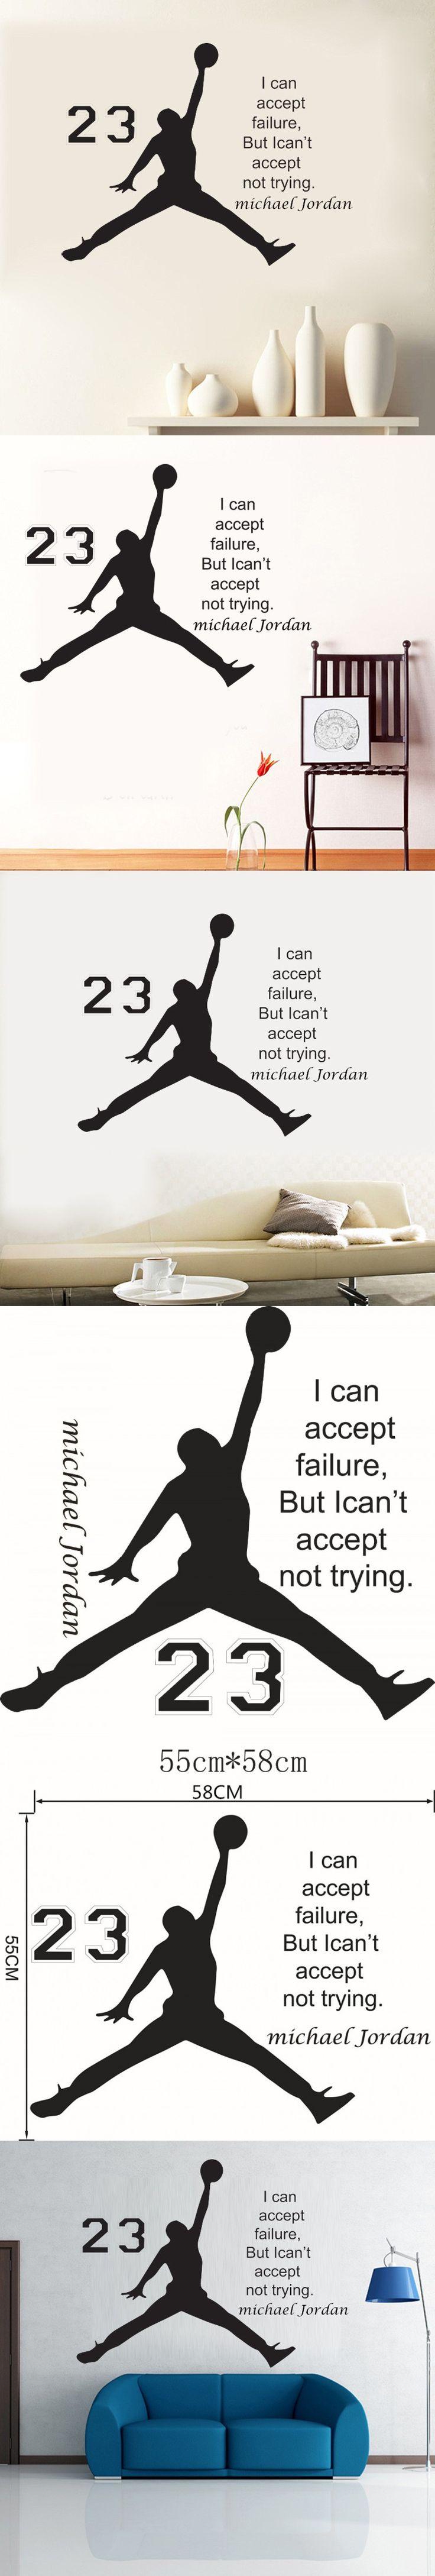 1pcs Michael Jordan Basketball Inspirational Wall Sticker Quotes Vinyl Wall  Decals Art Kids Children Room Bedroom Part 52